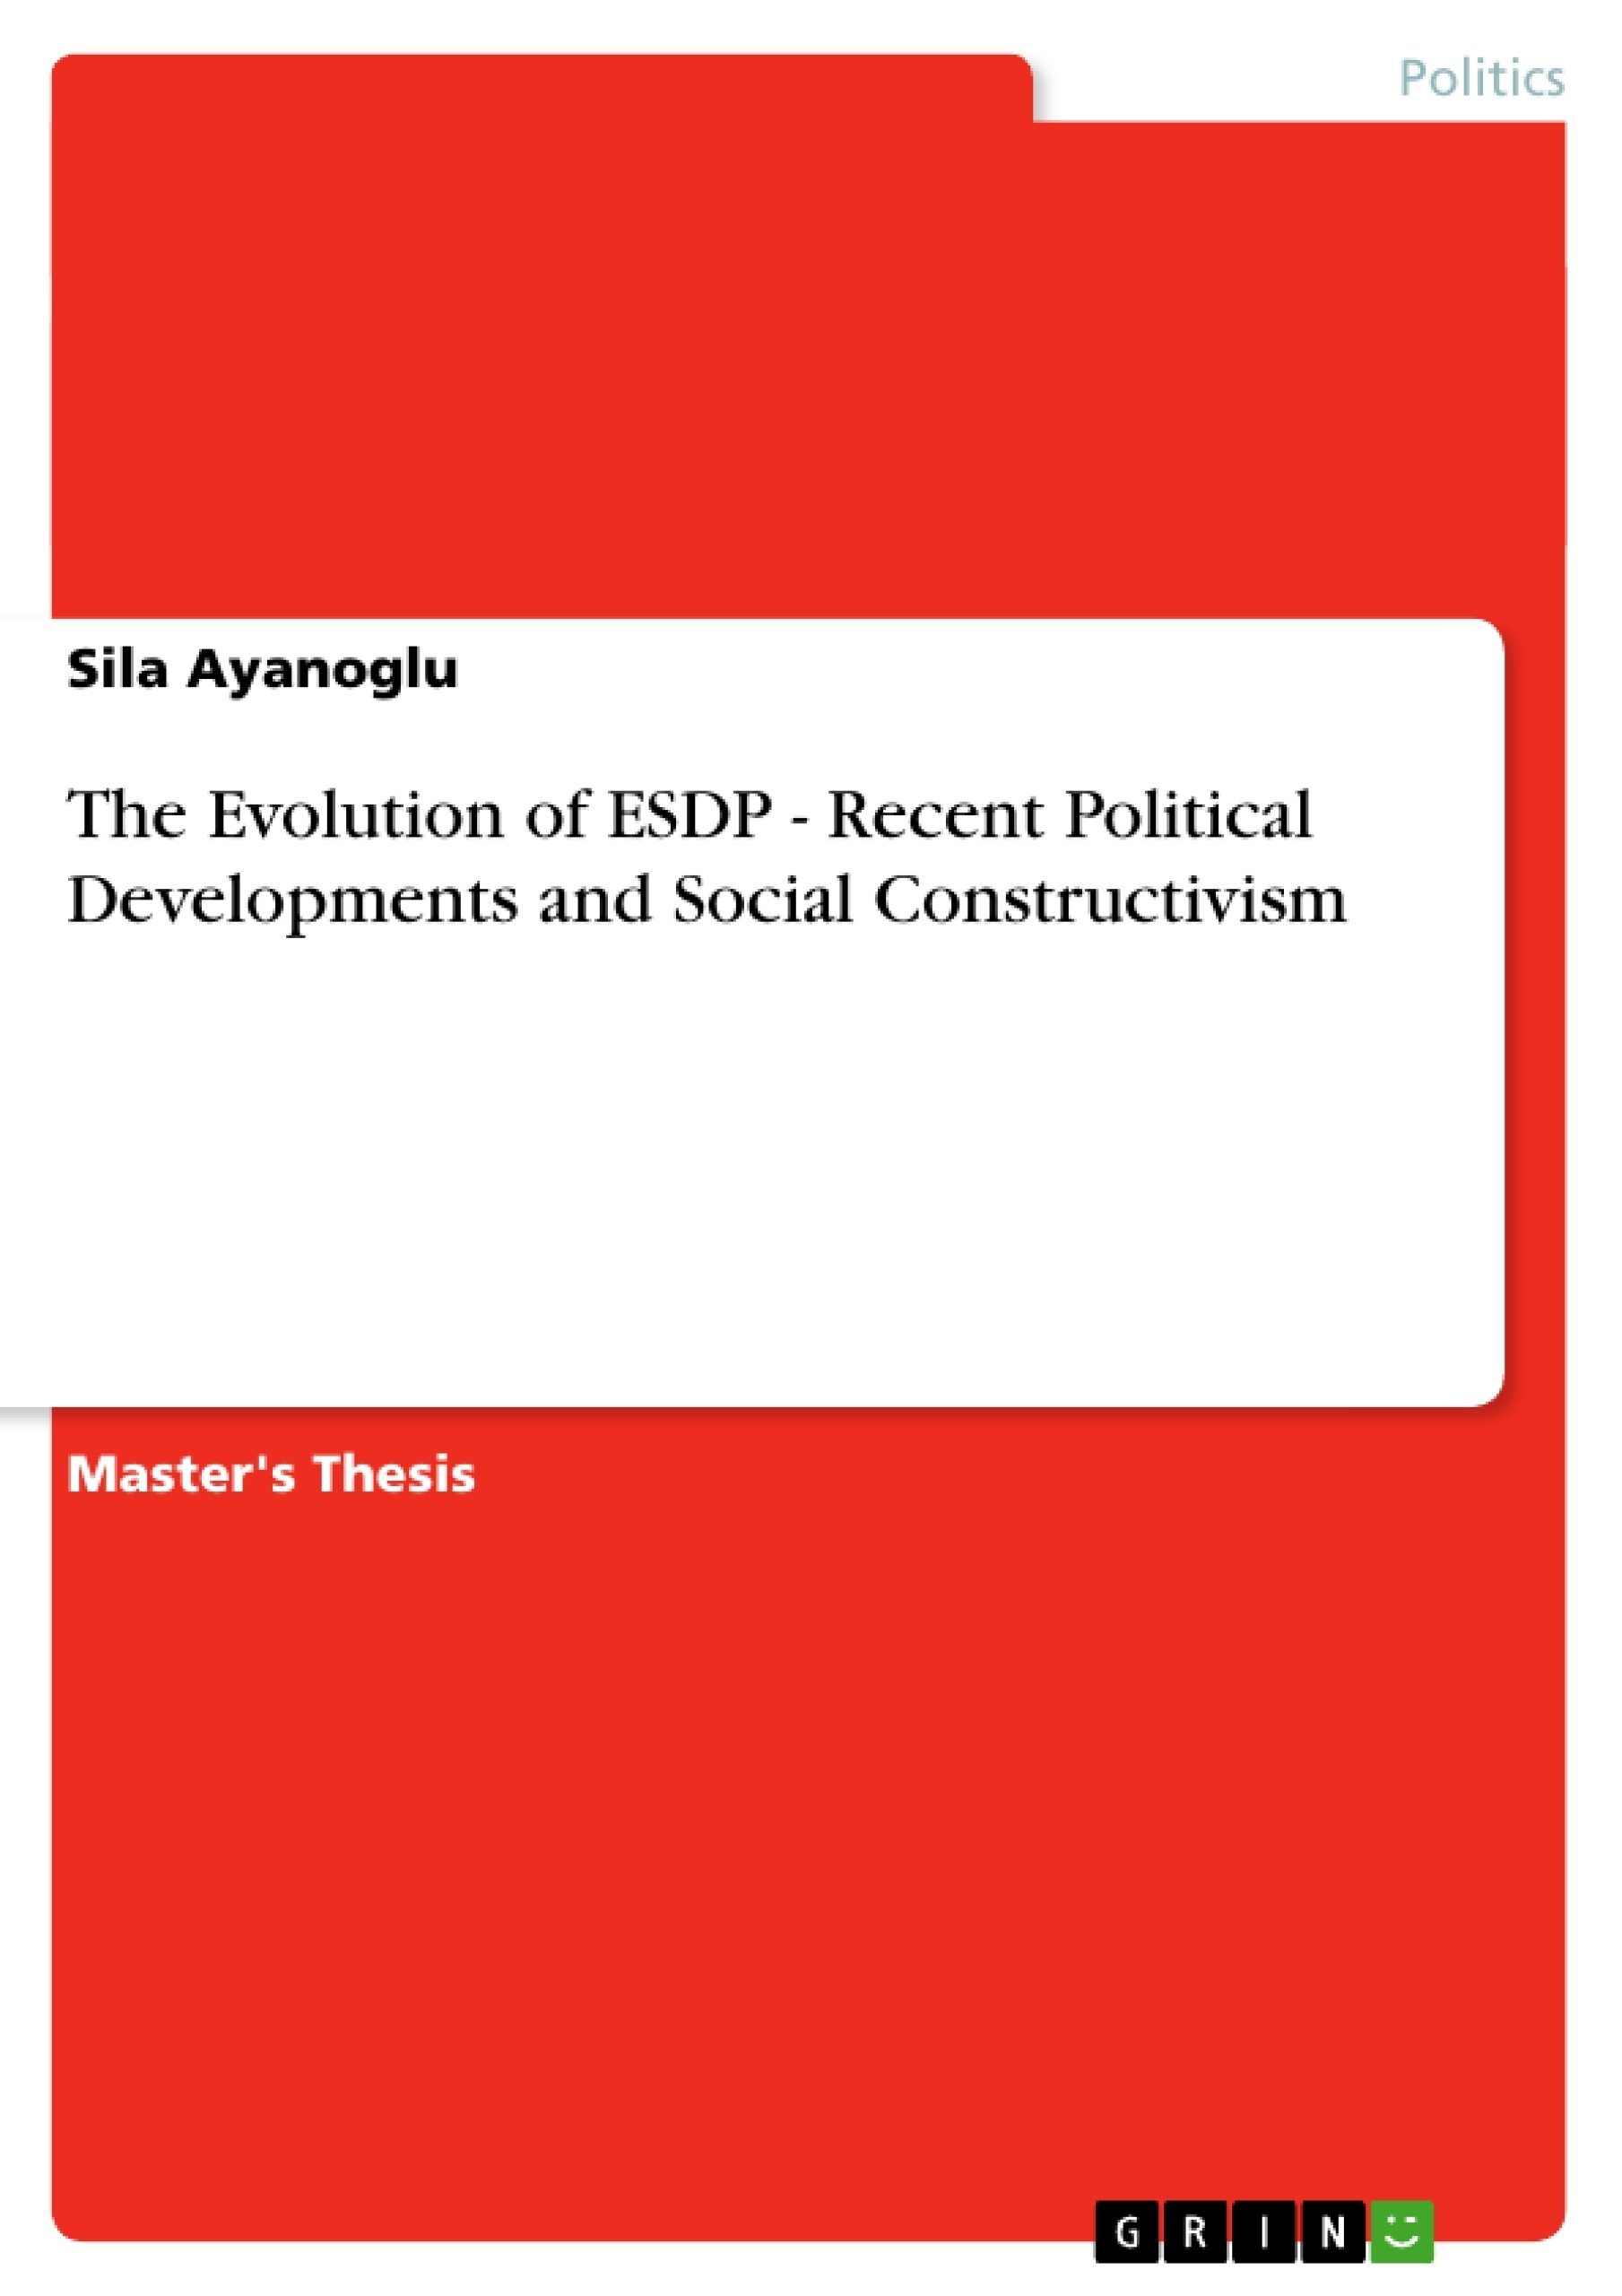 Title: The Evolution of ESDP - Recent Political Developments and Social Constructivism